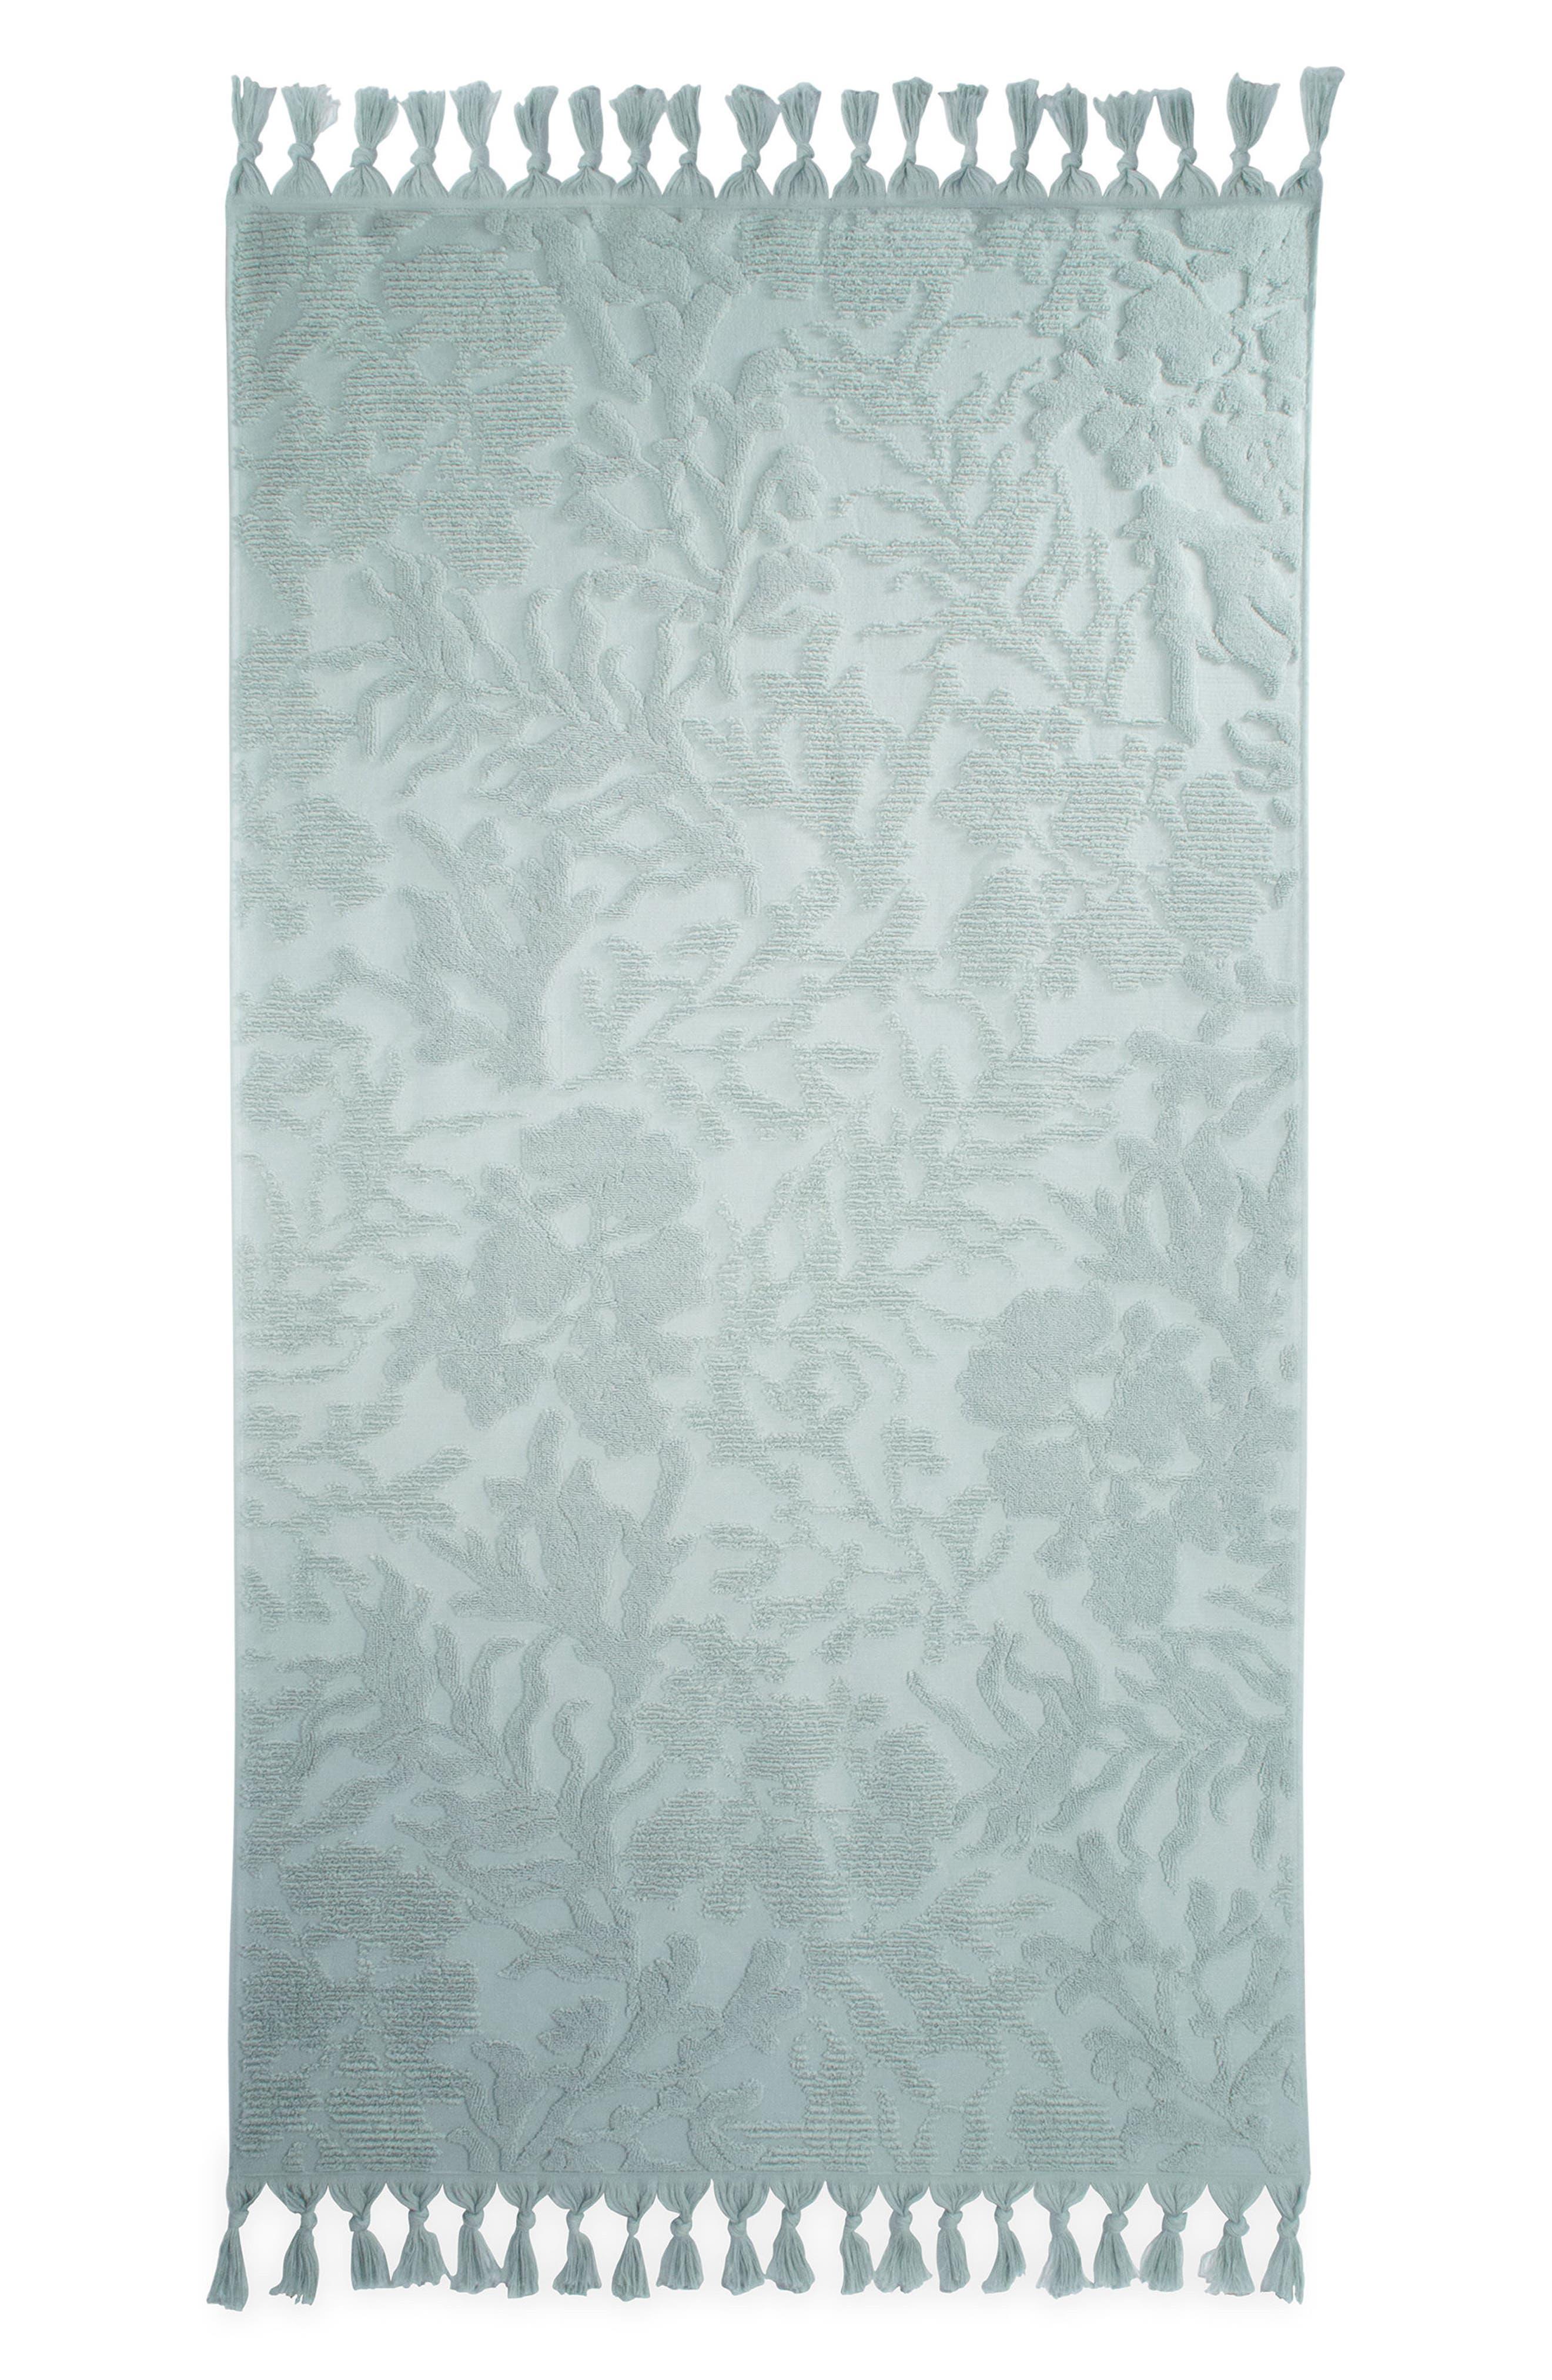 Ocean Reef Bath Towel,                             Main thumbnail 1, color,                             SEAFOAM